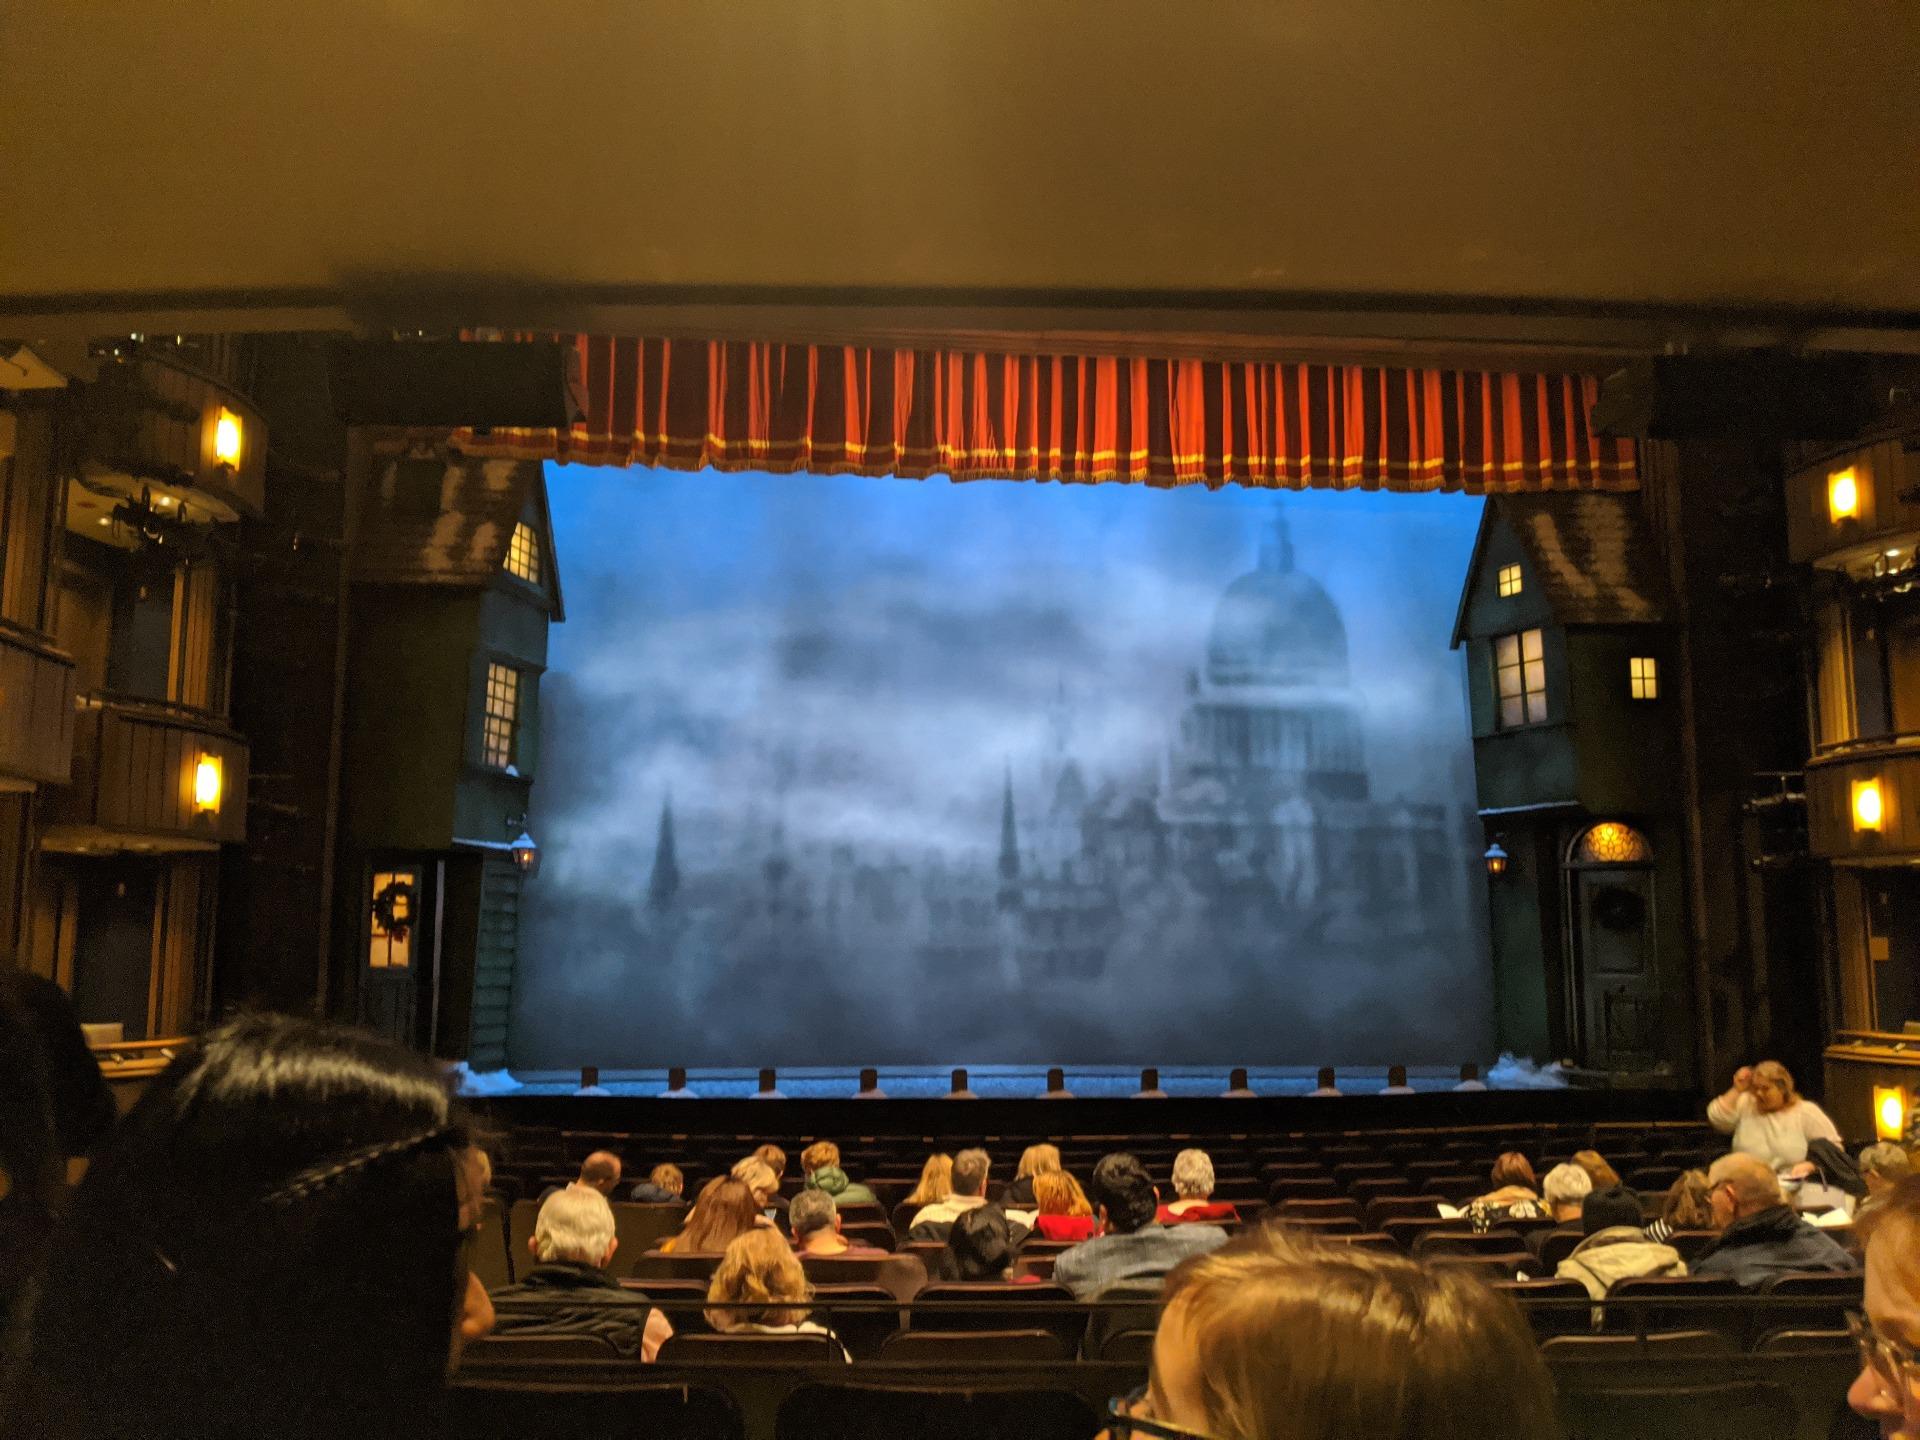 Goodman Theatre - Albert Theatre Secção Aisle 3 Fila P Lugar 23